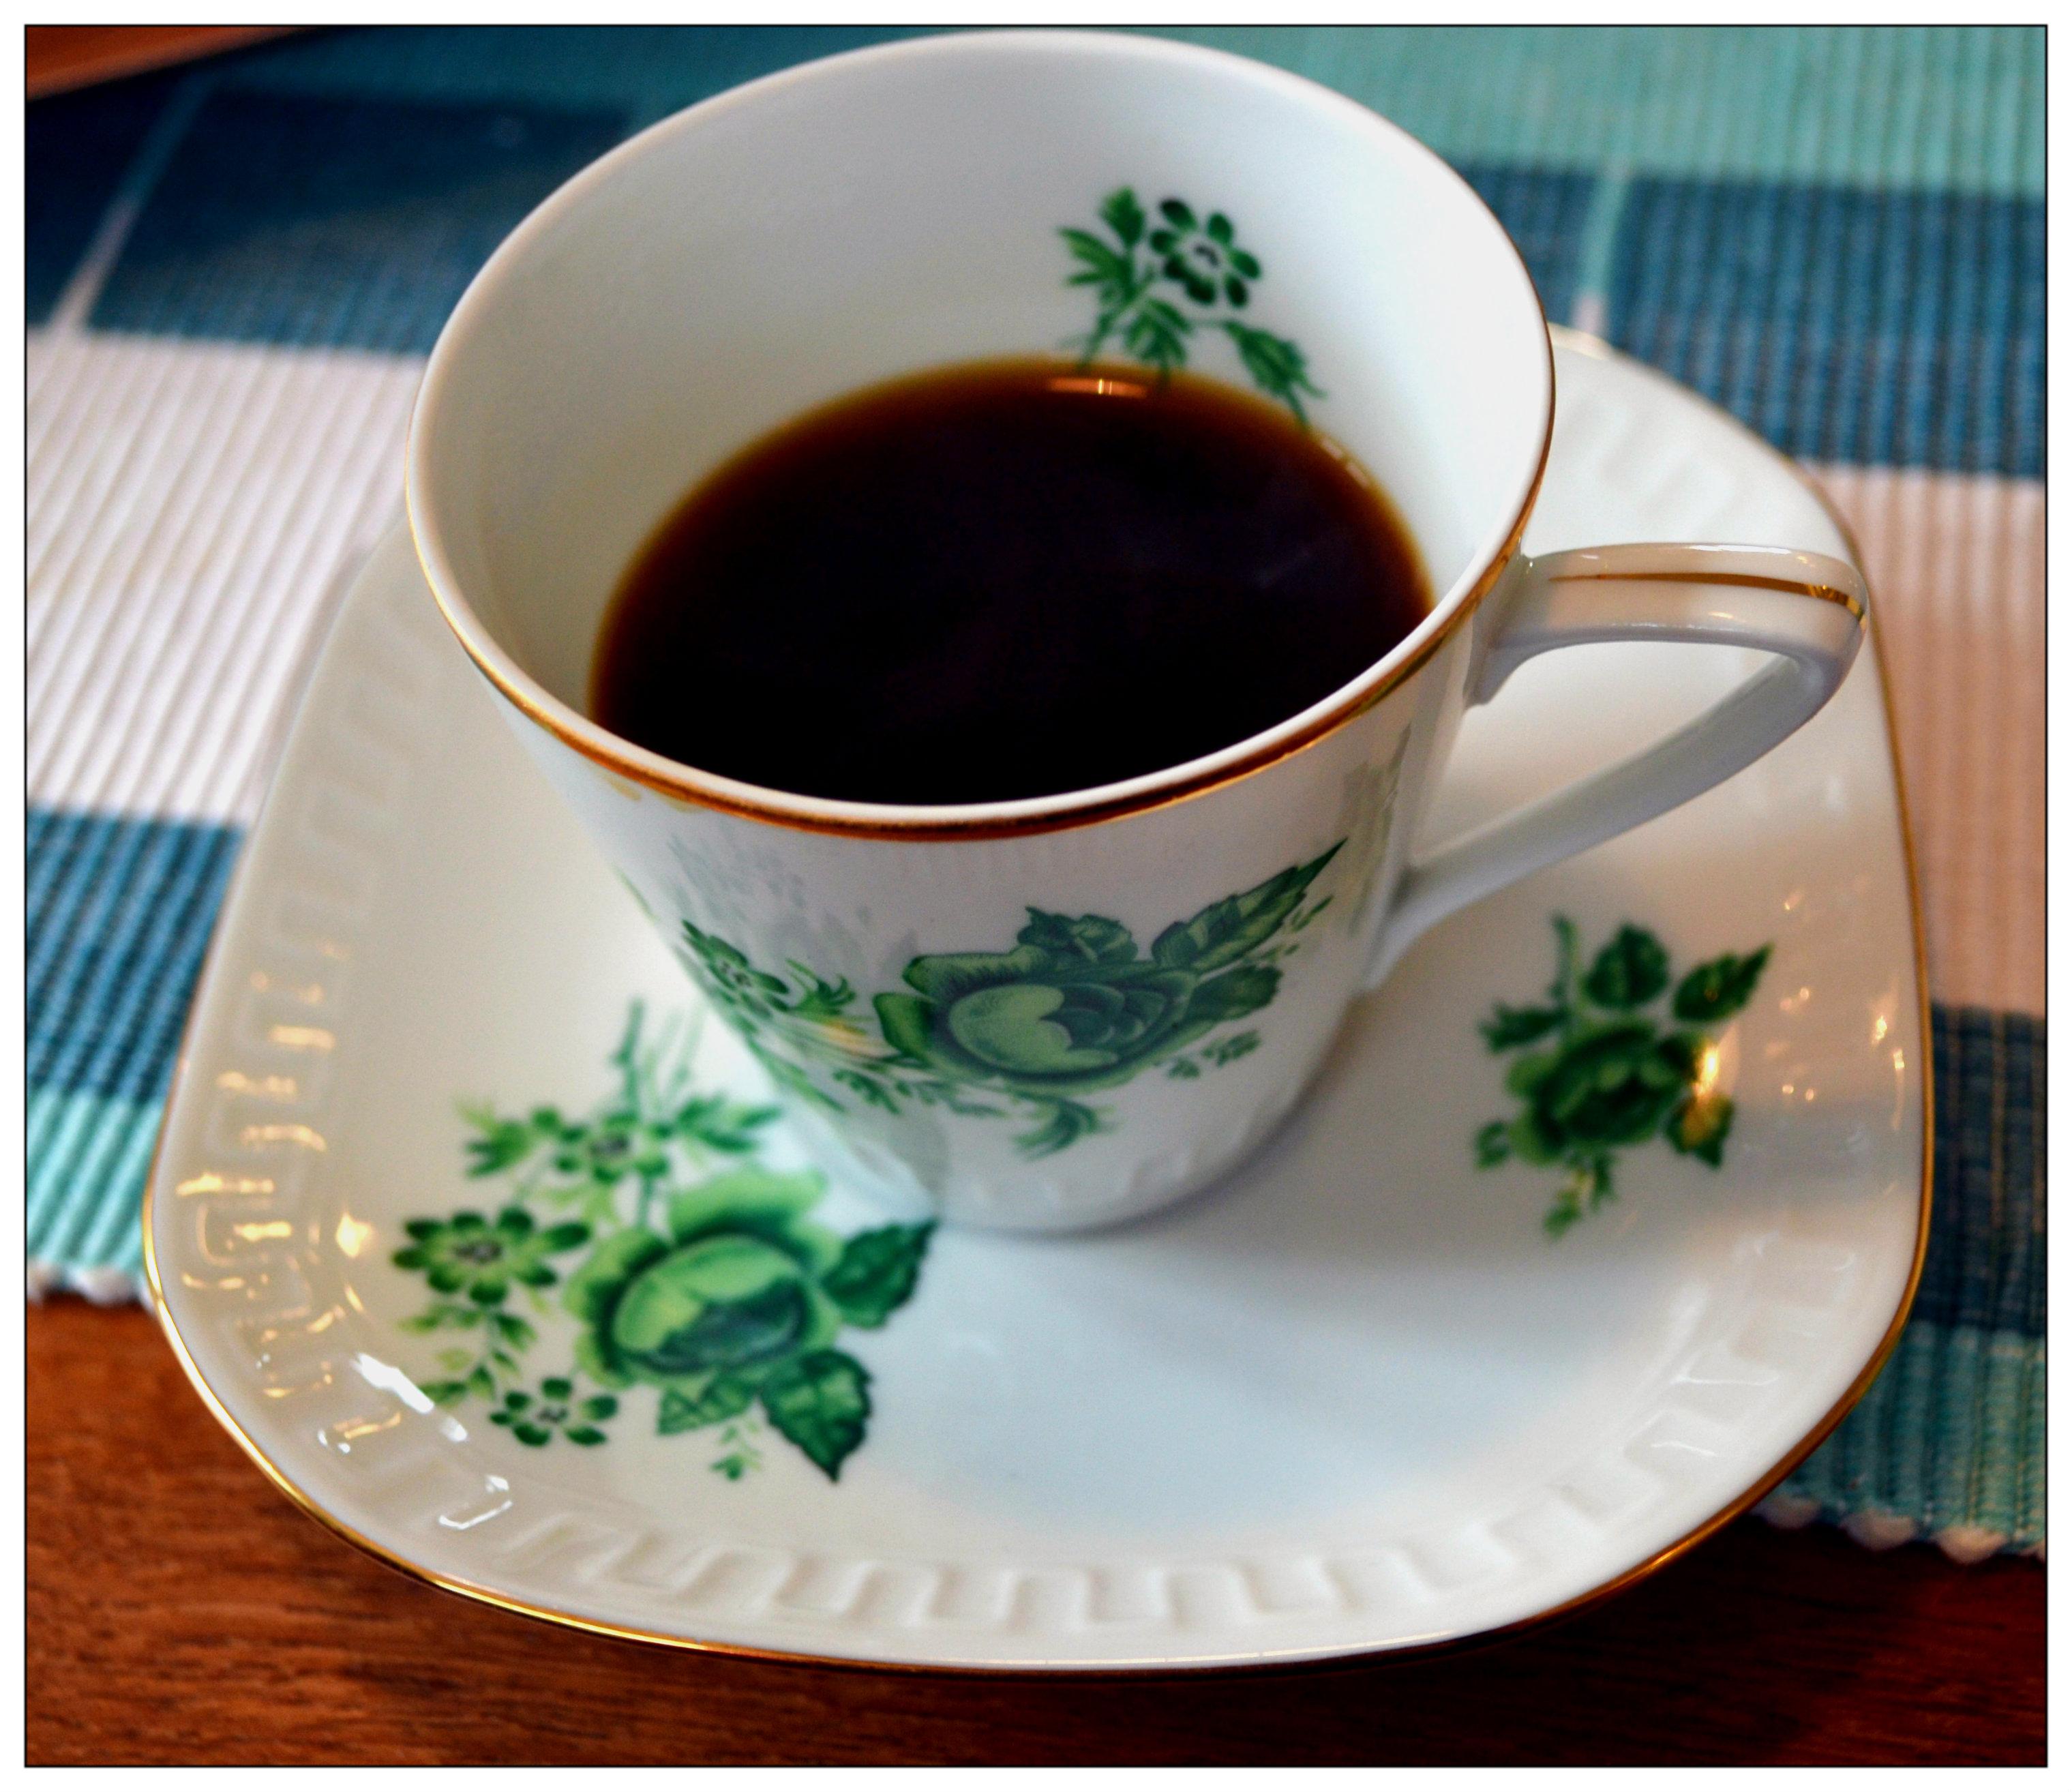 kaffe gram per kopp